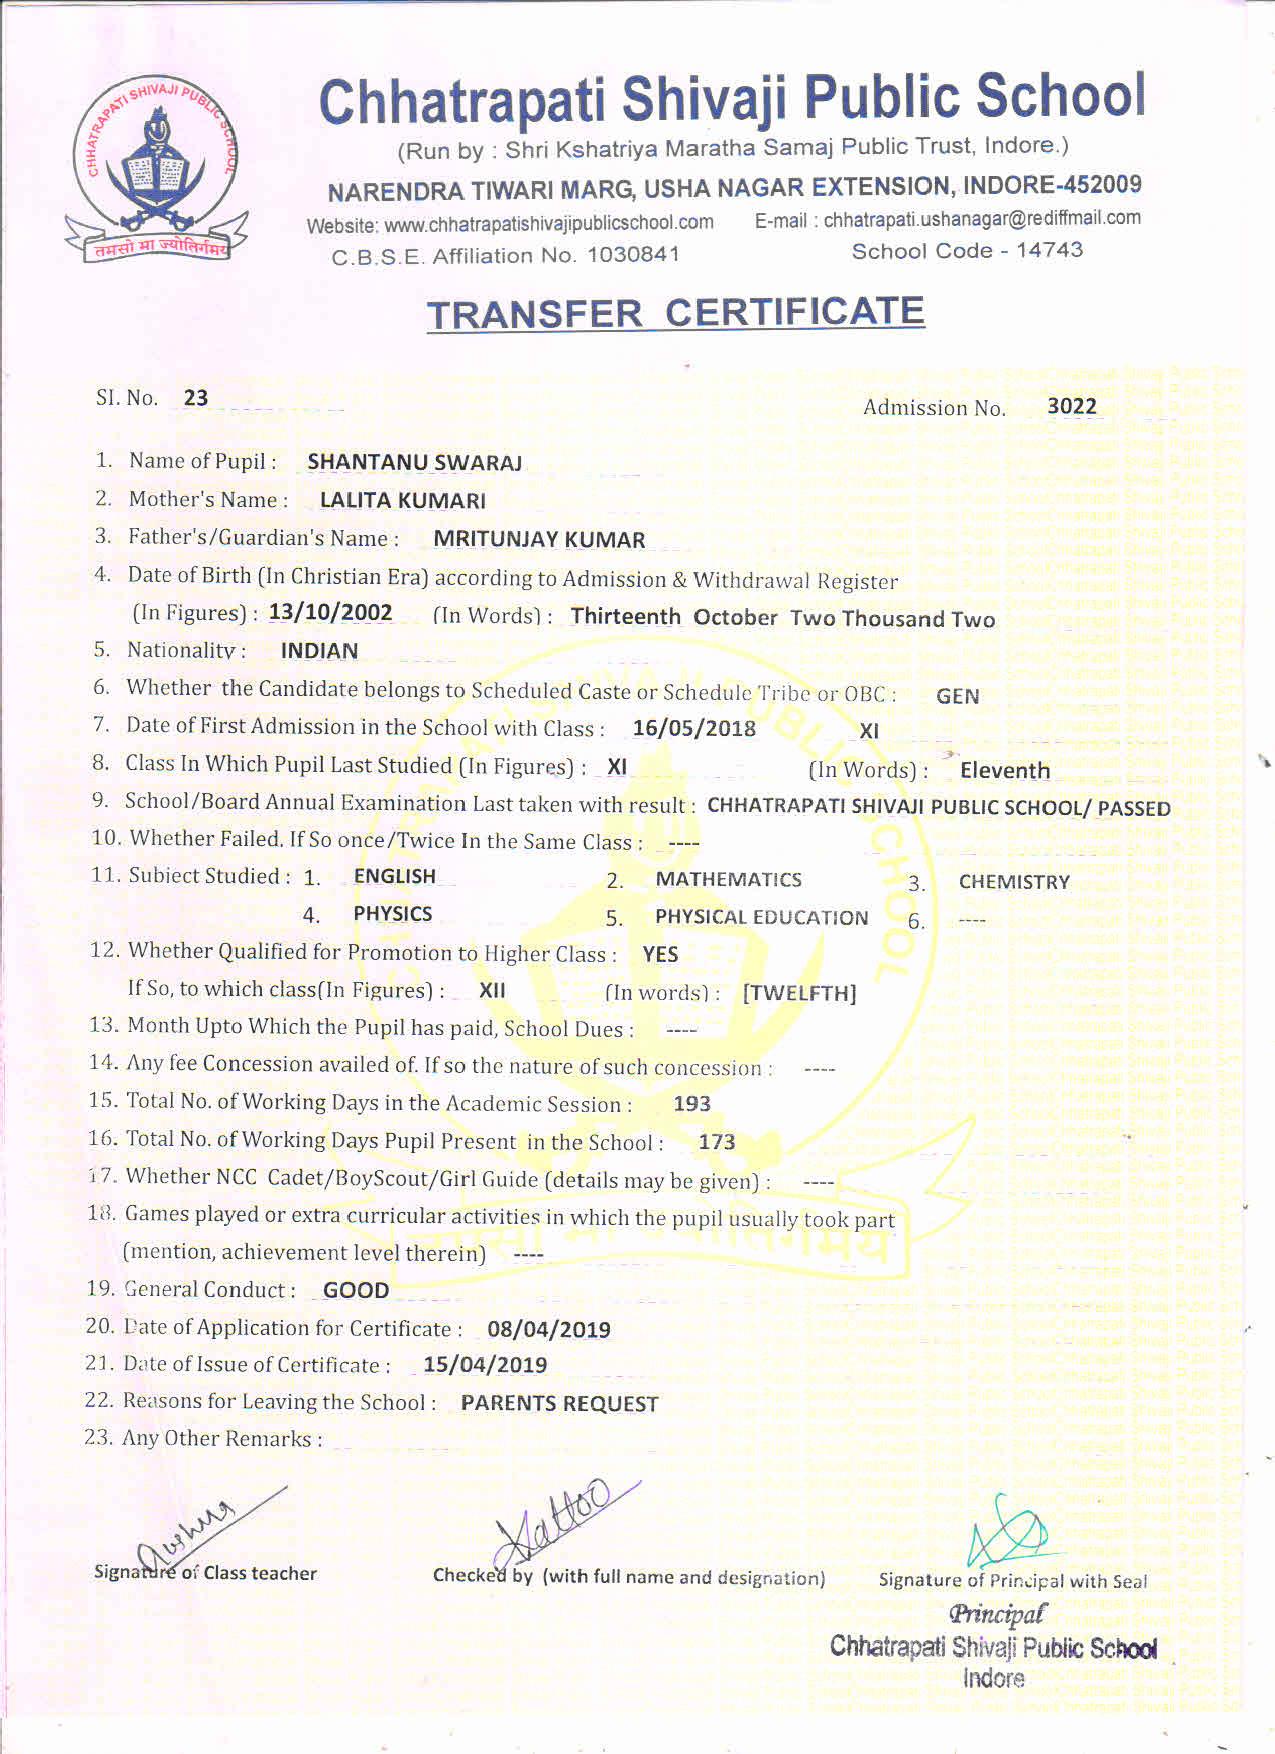 Shantanu Swaraj (TC)